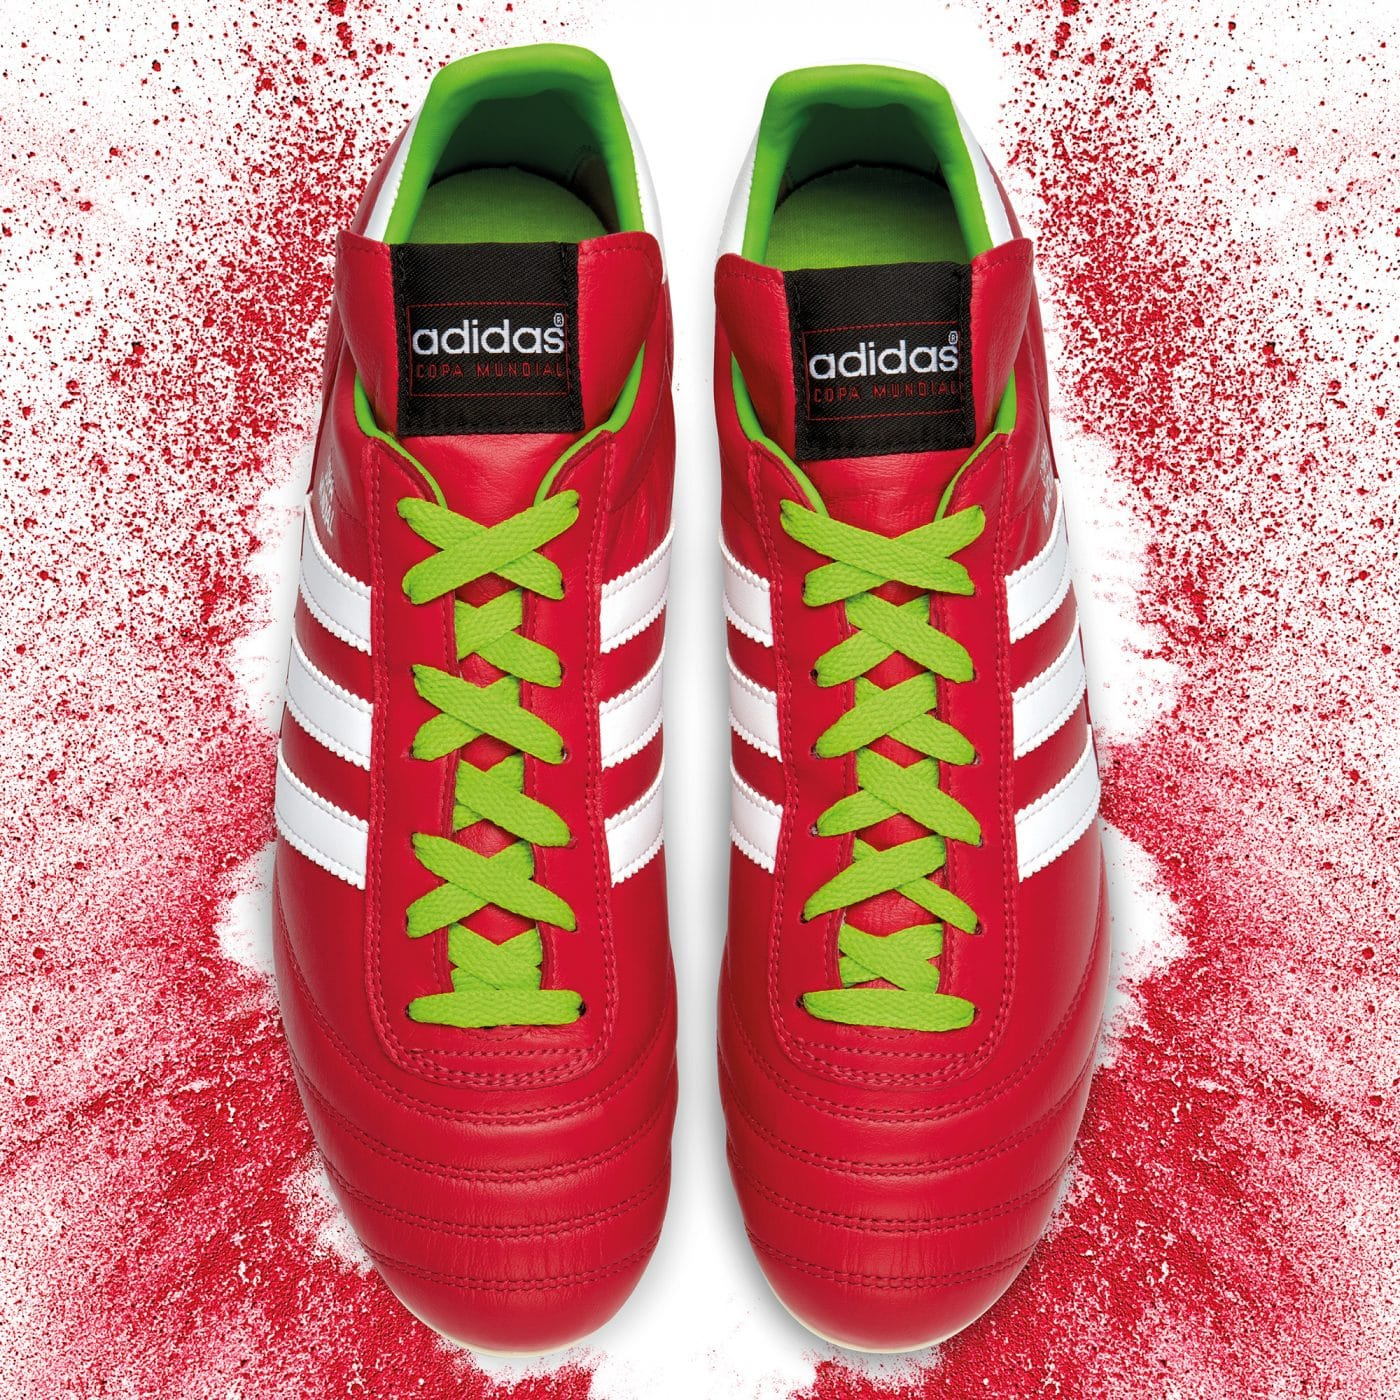 adidas-copa-mundial-samba-pack-rose